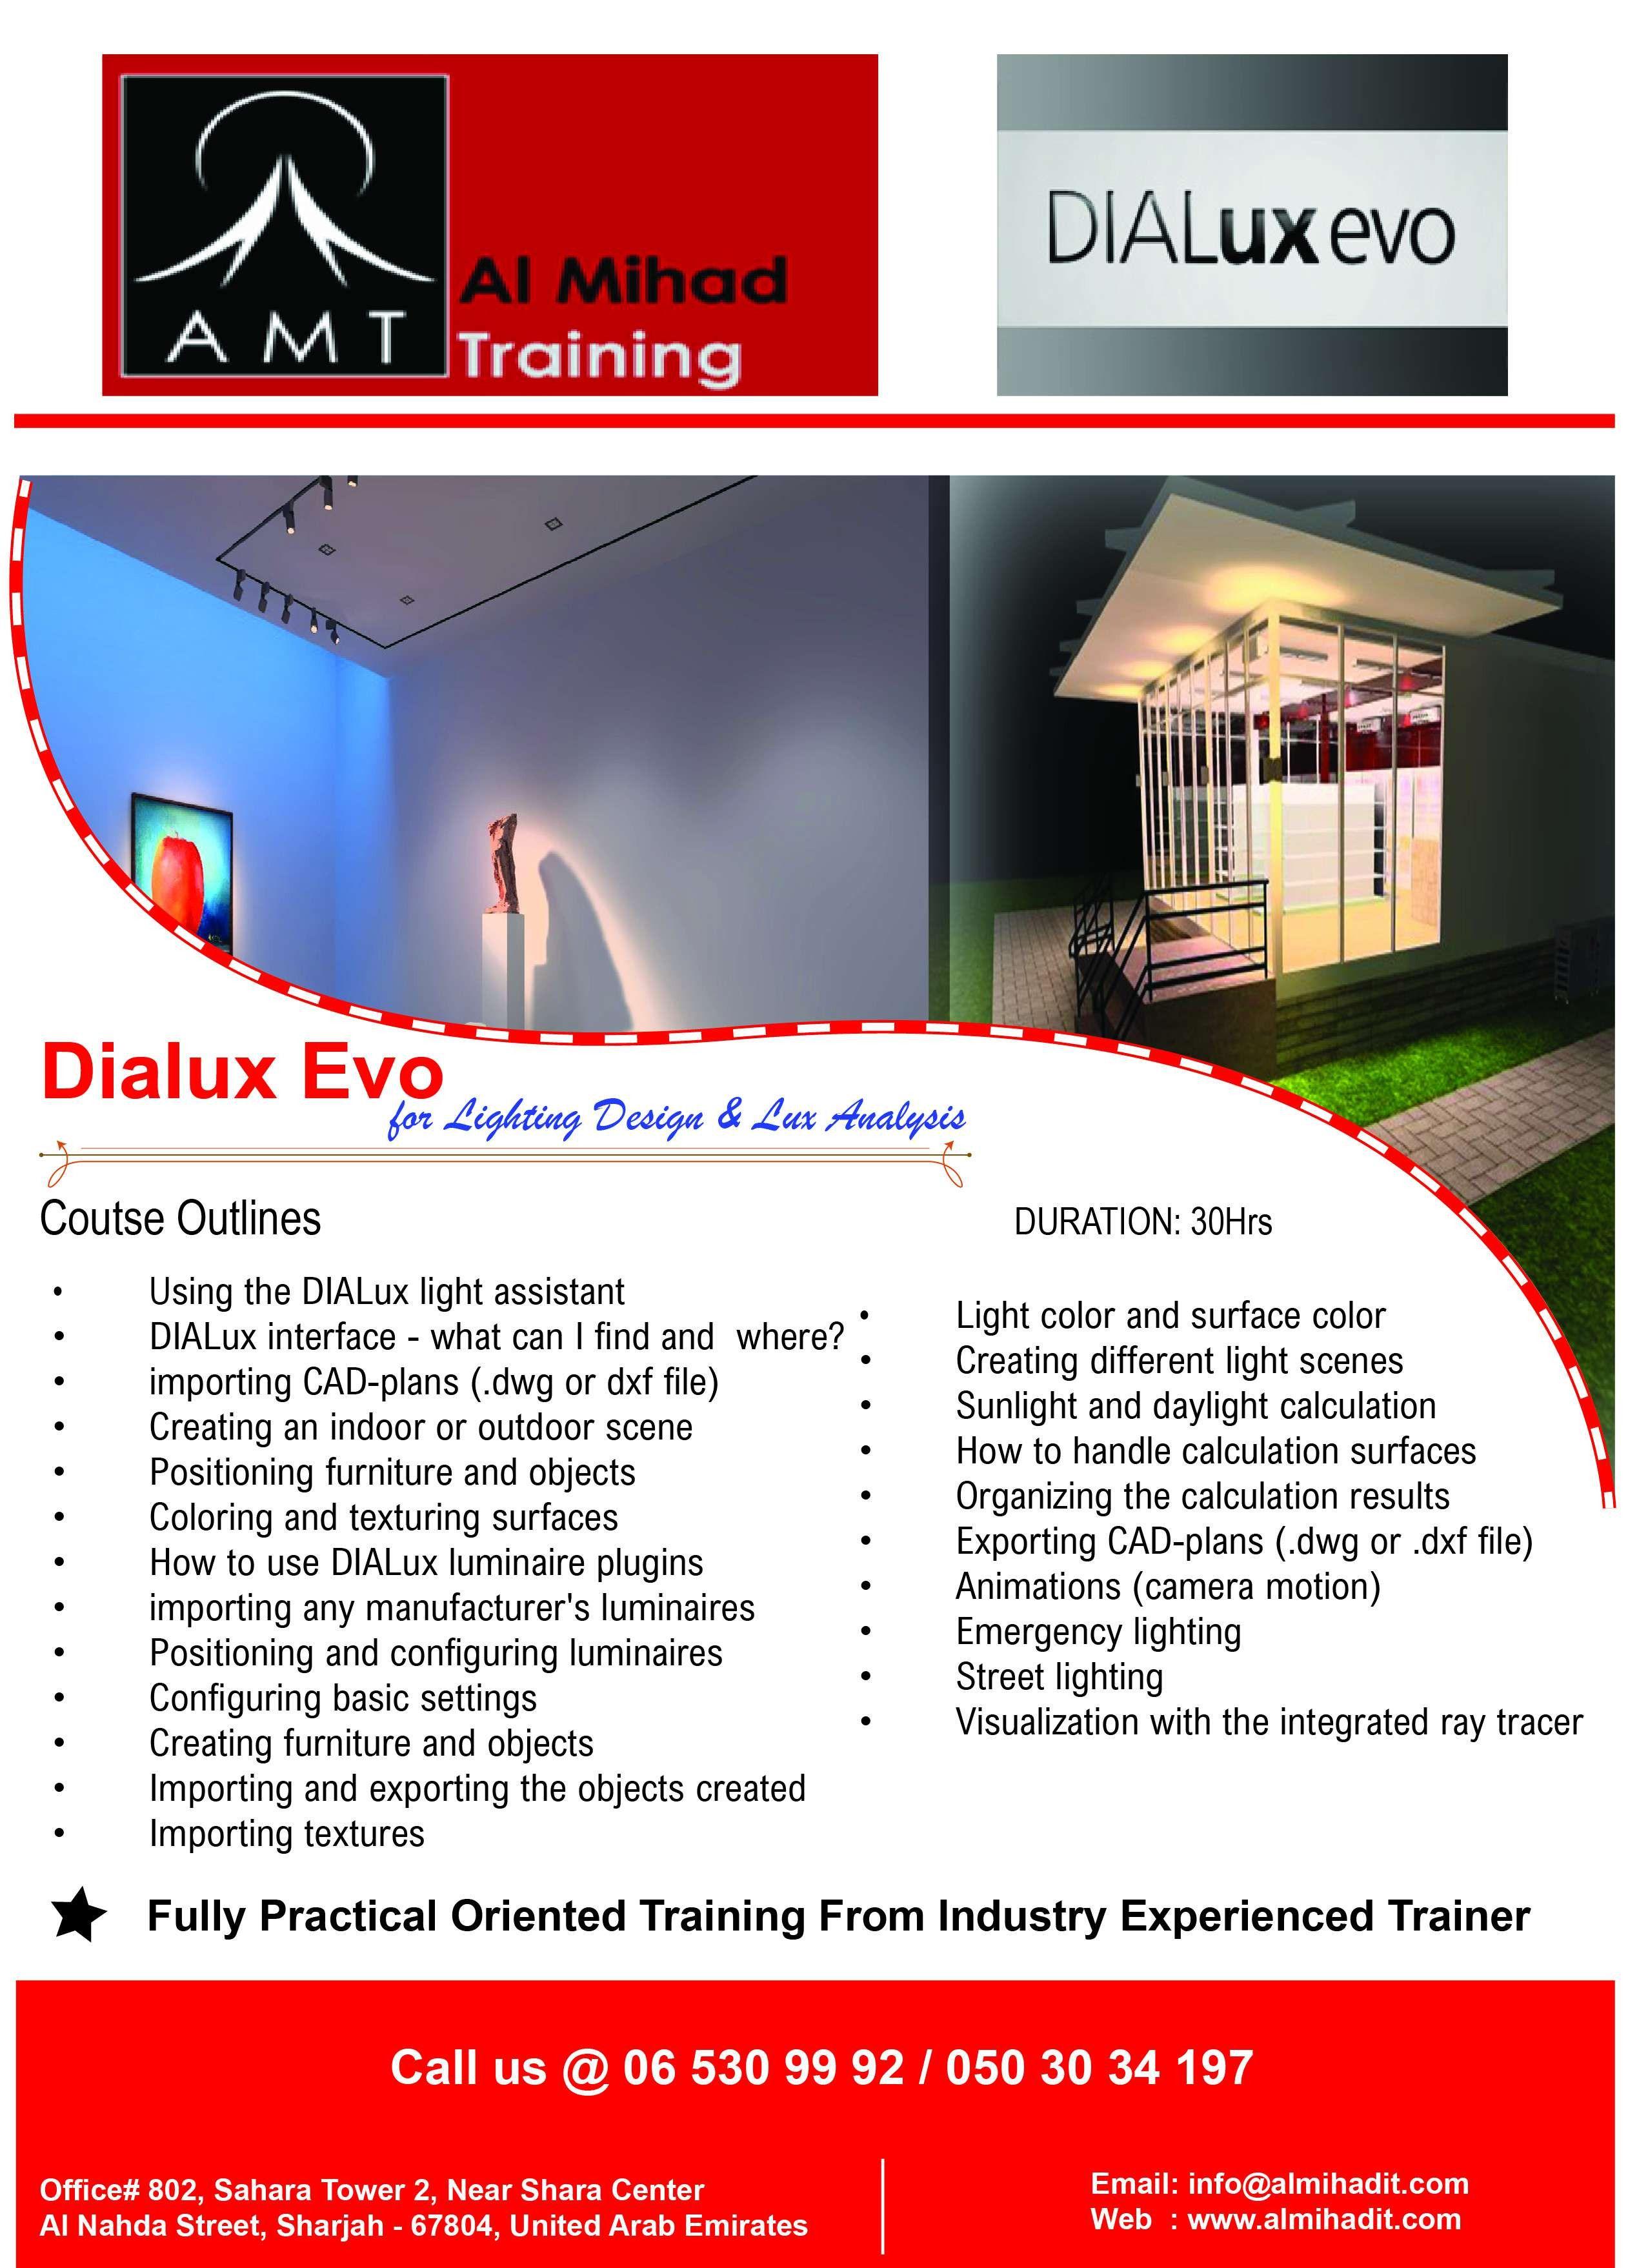 Al Mihad Training 1